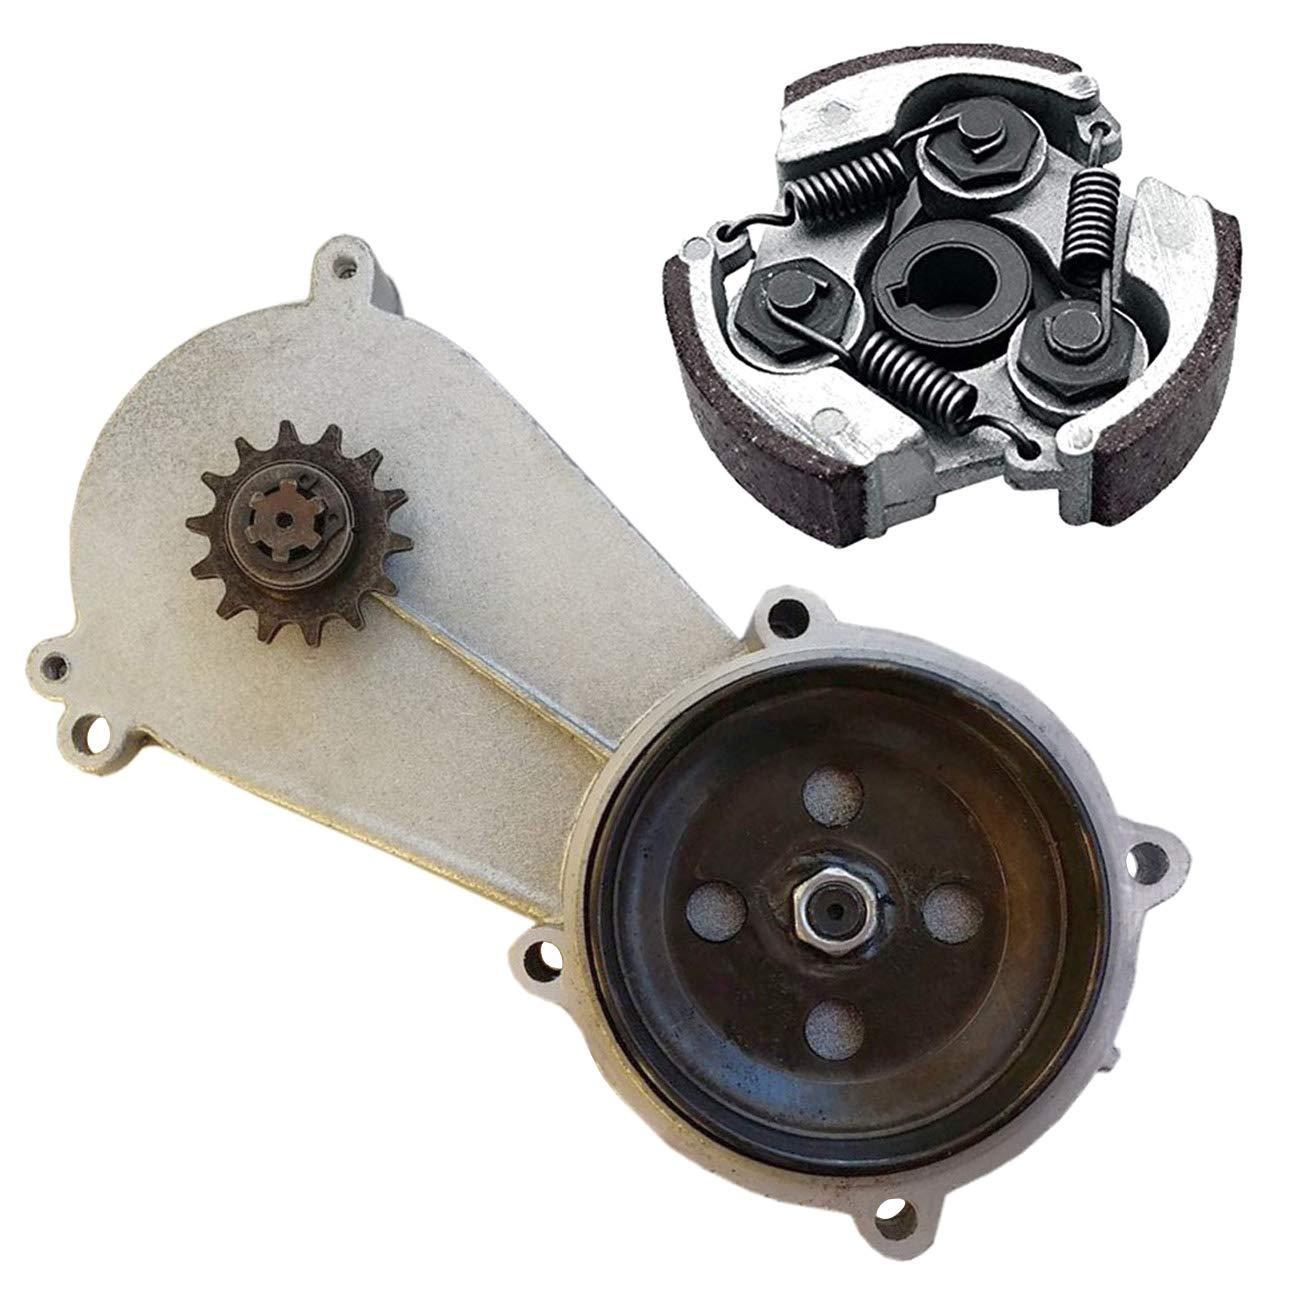 ZXTDR 14 Tooth T8F Transmission Reduction Gear Box Gearbox & Clutch Pad for 47cc 49cc 2-Stroke Pocket Mini Bike